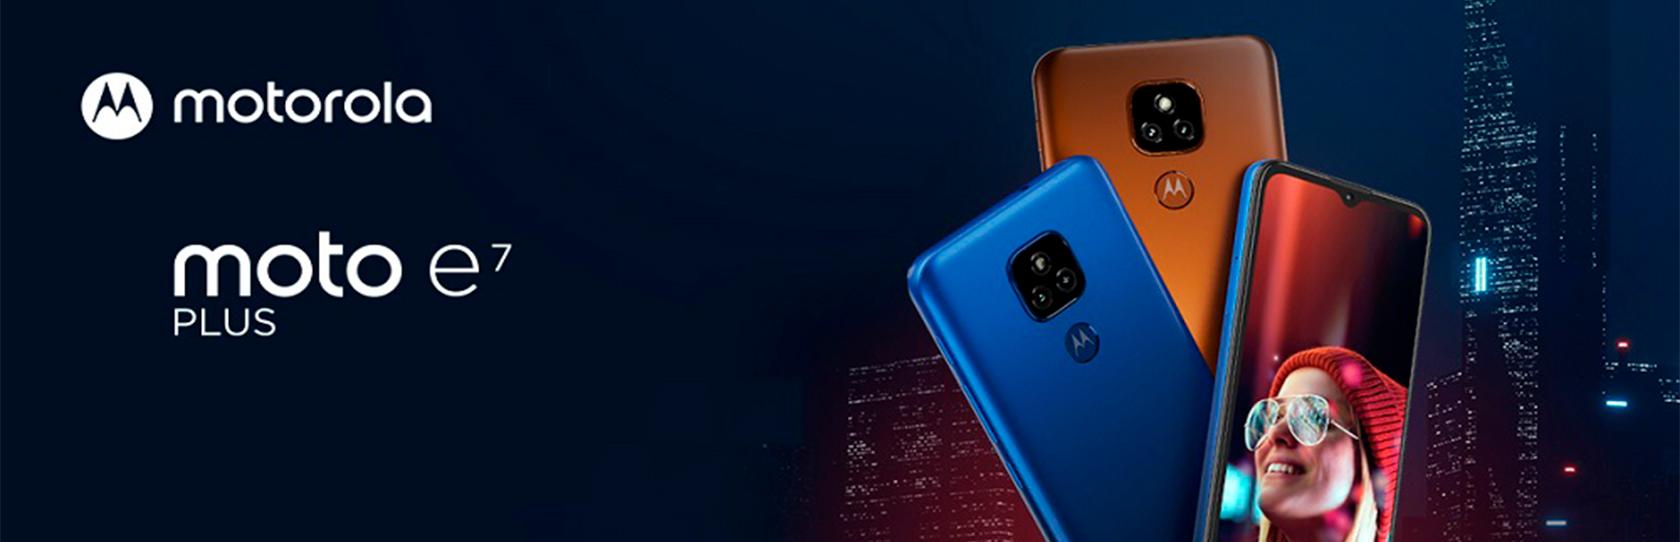 Celular Motorola E7 Plus 64GB